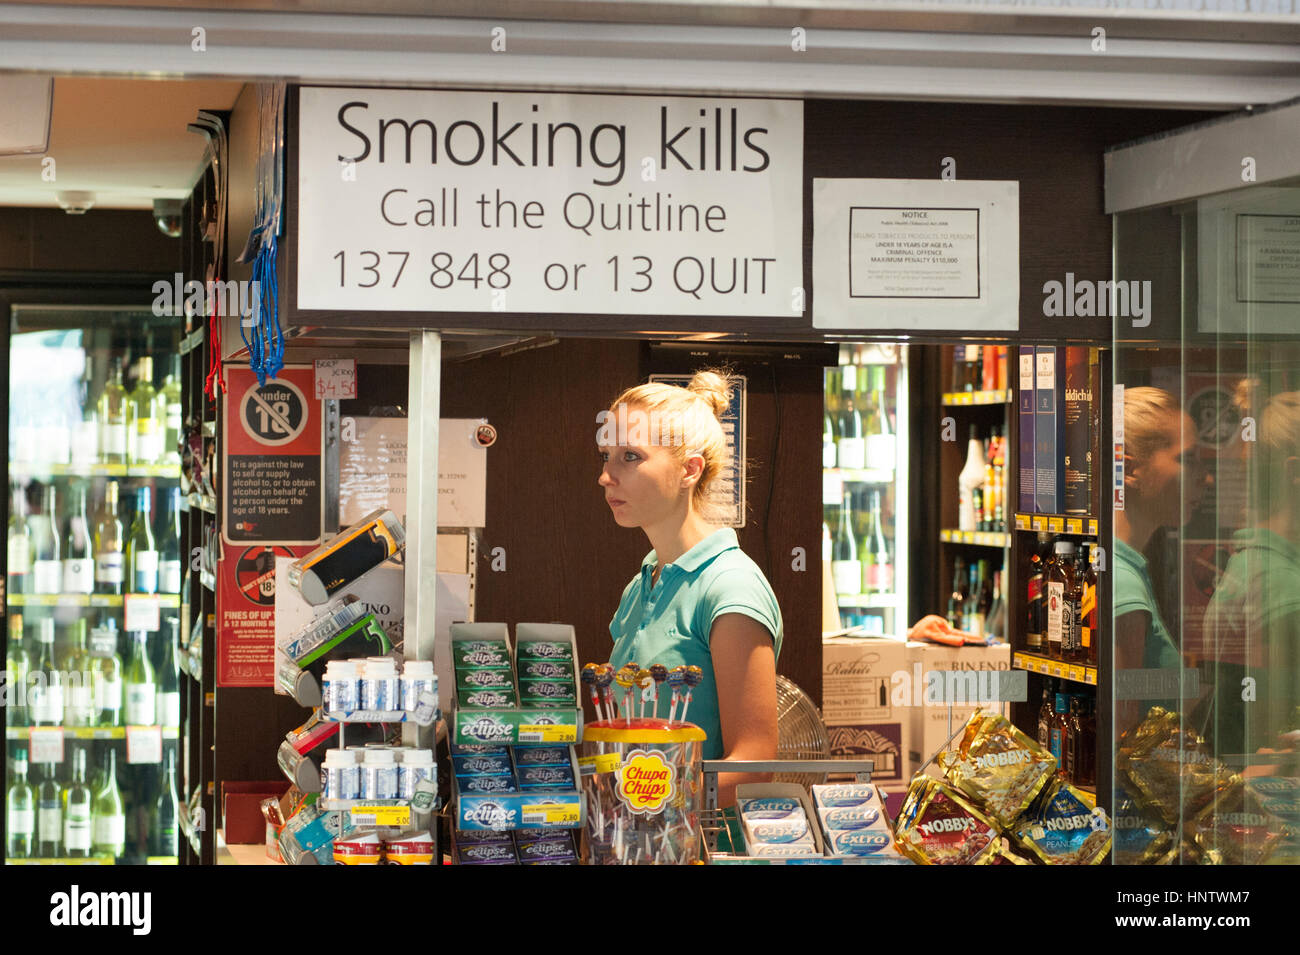 Smoking Kills Signage in Australian convenience shop - Stock Image